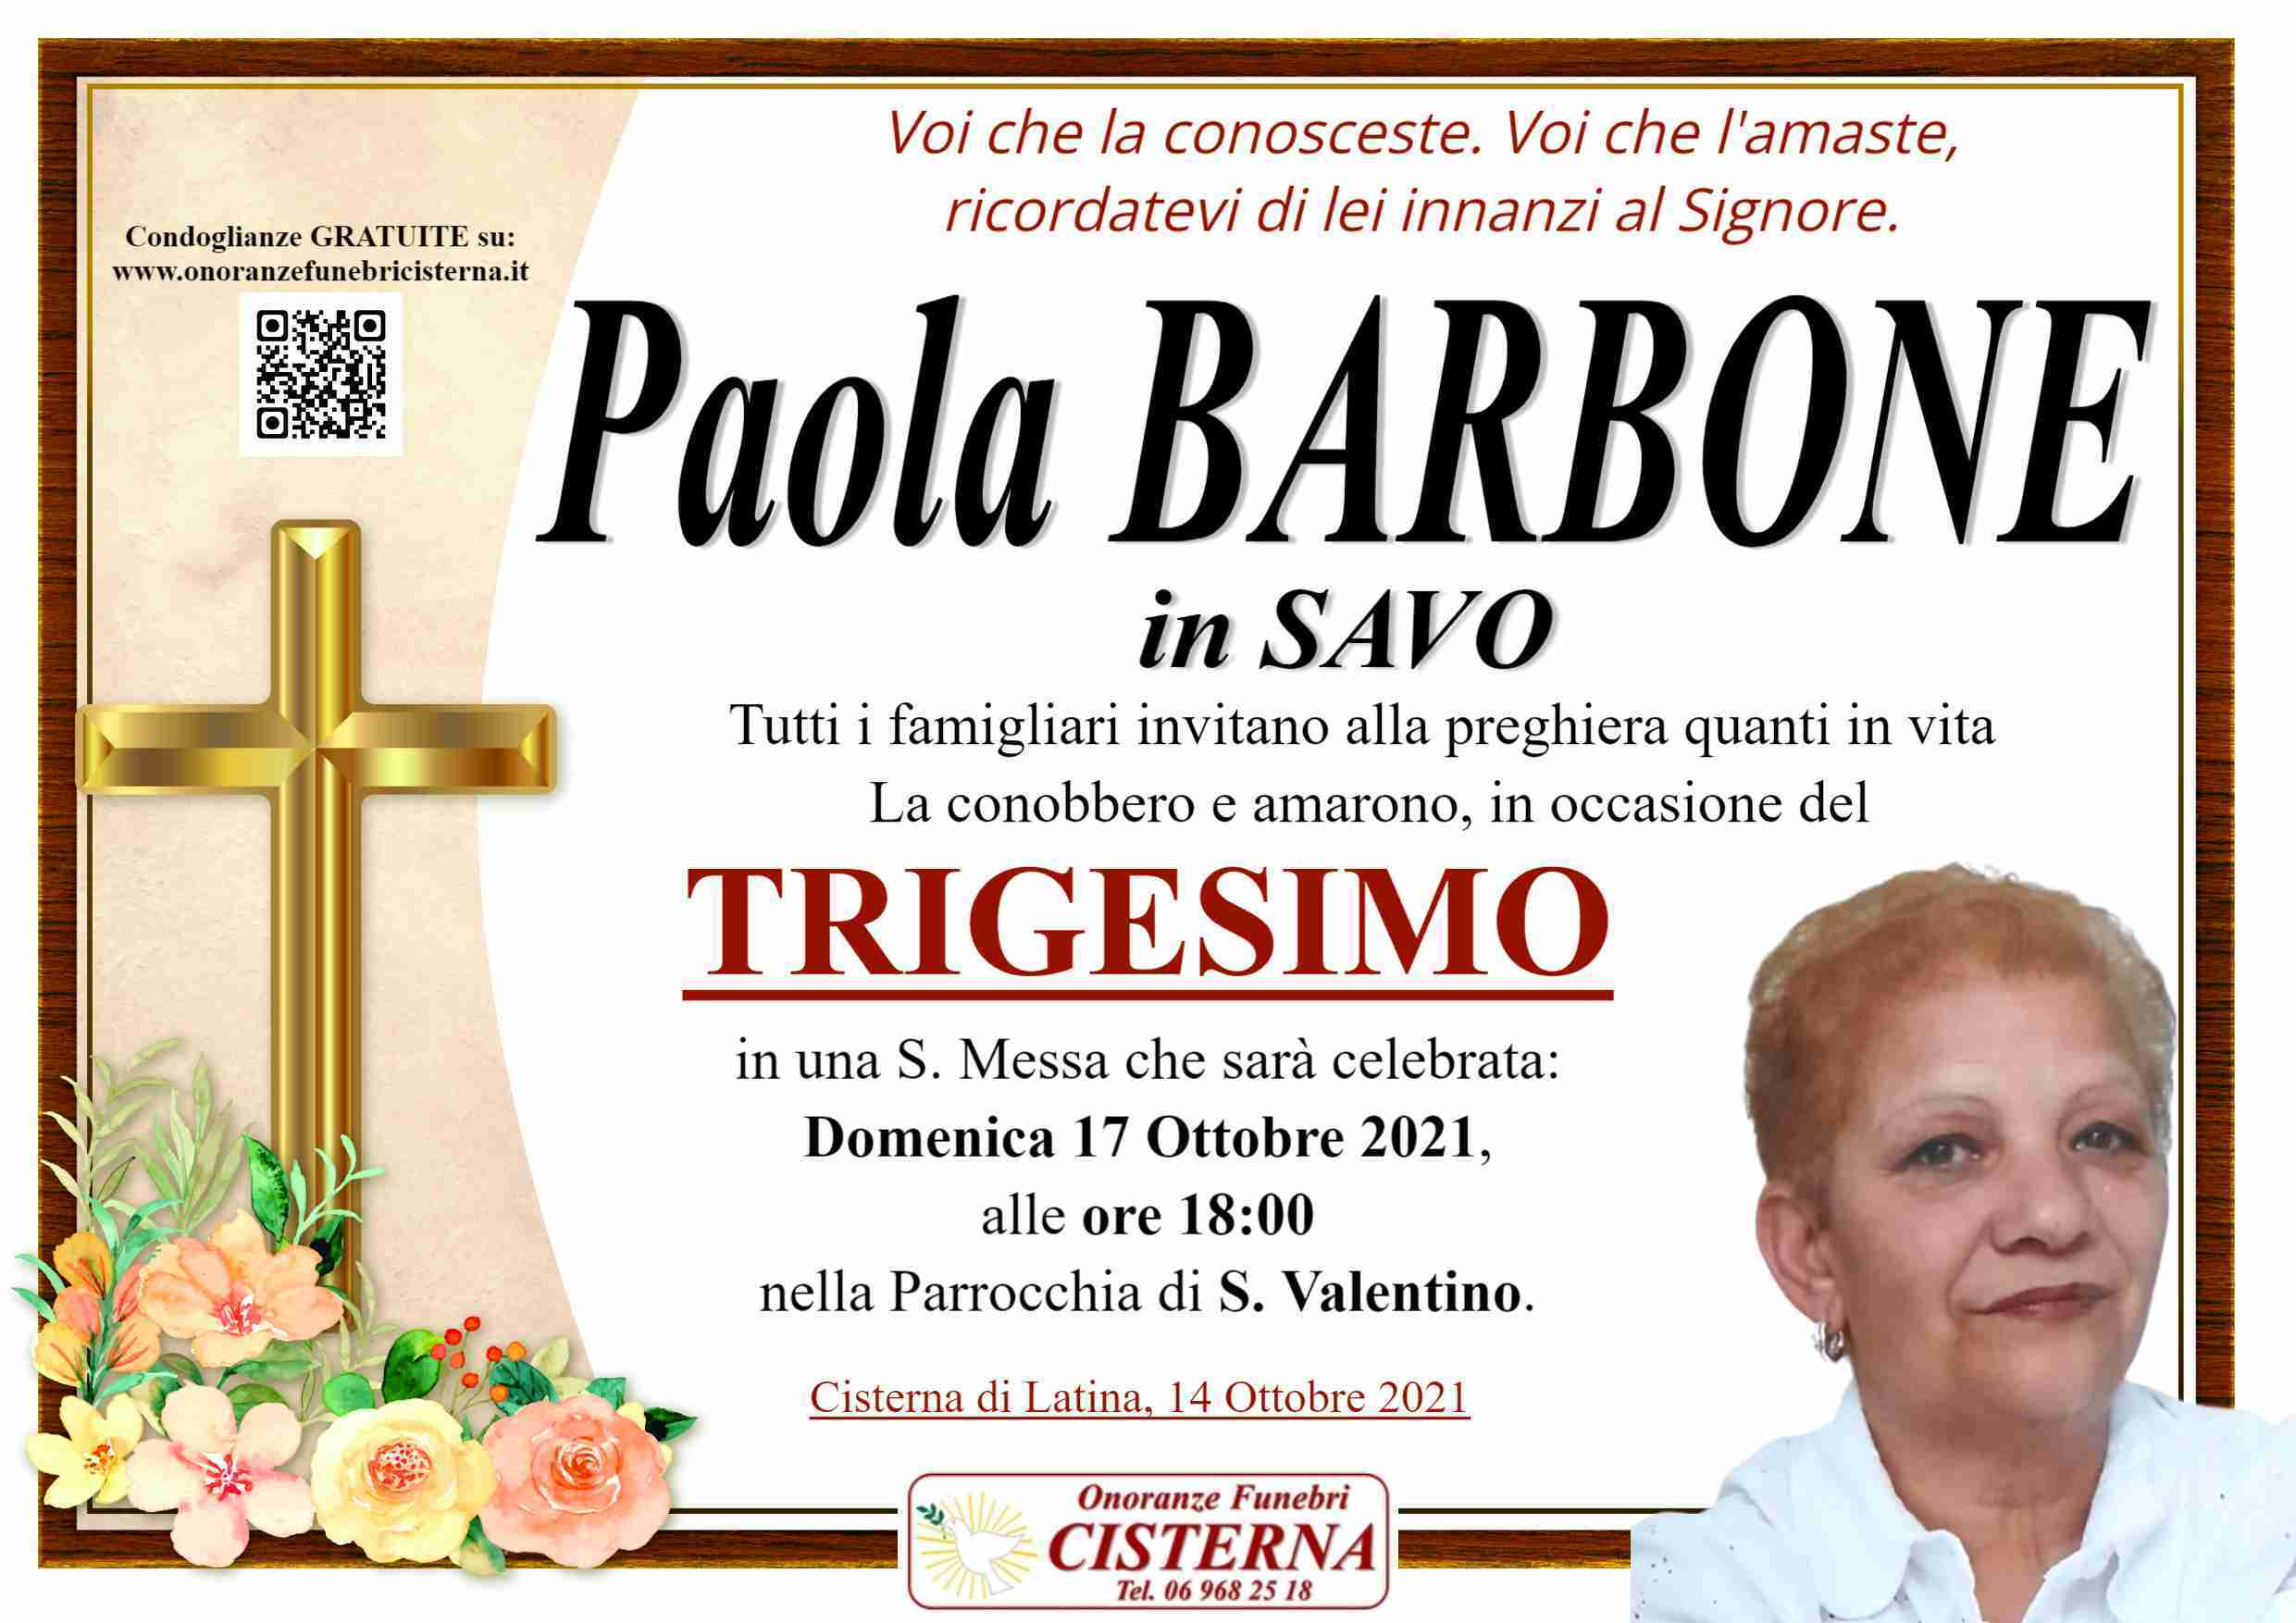 Paola Barbone